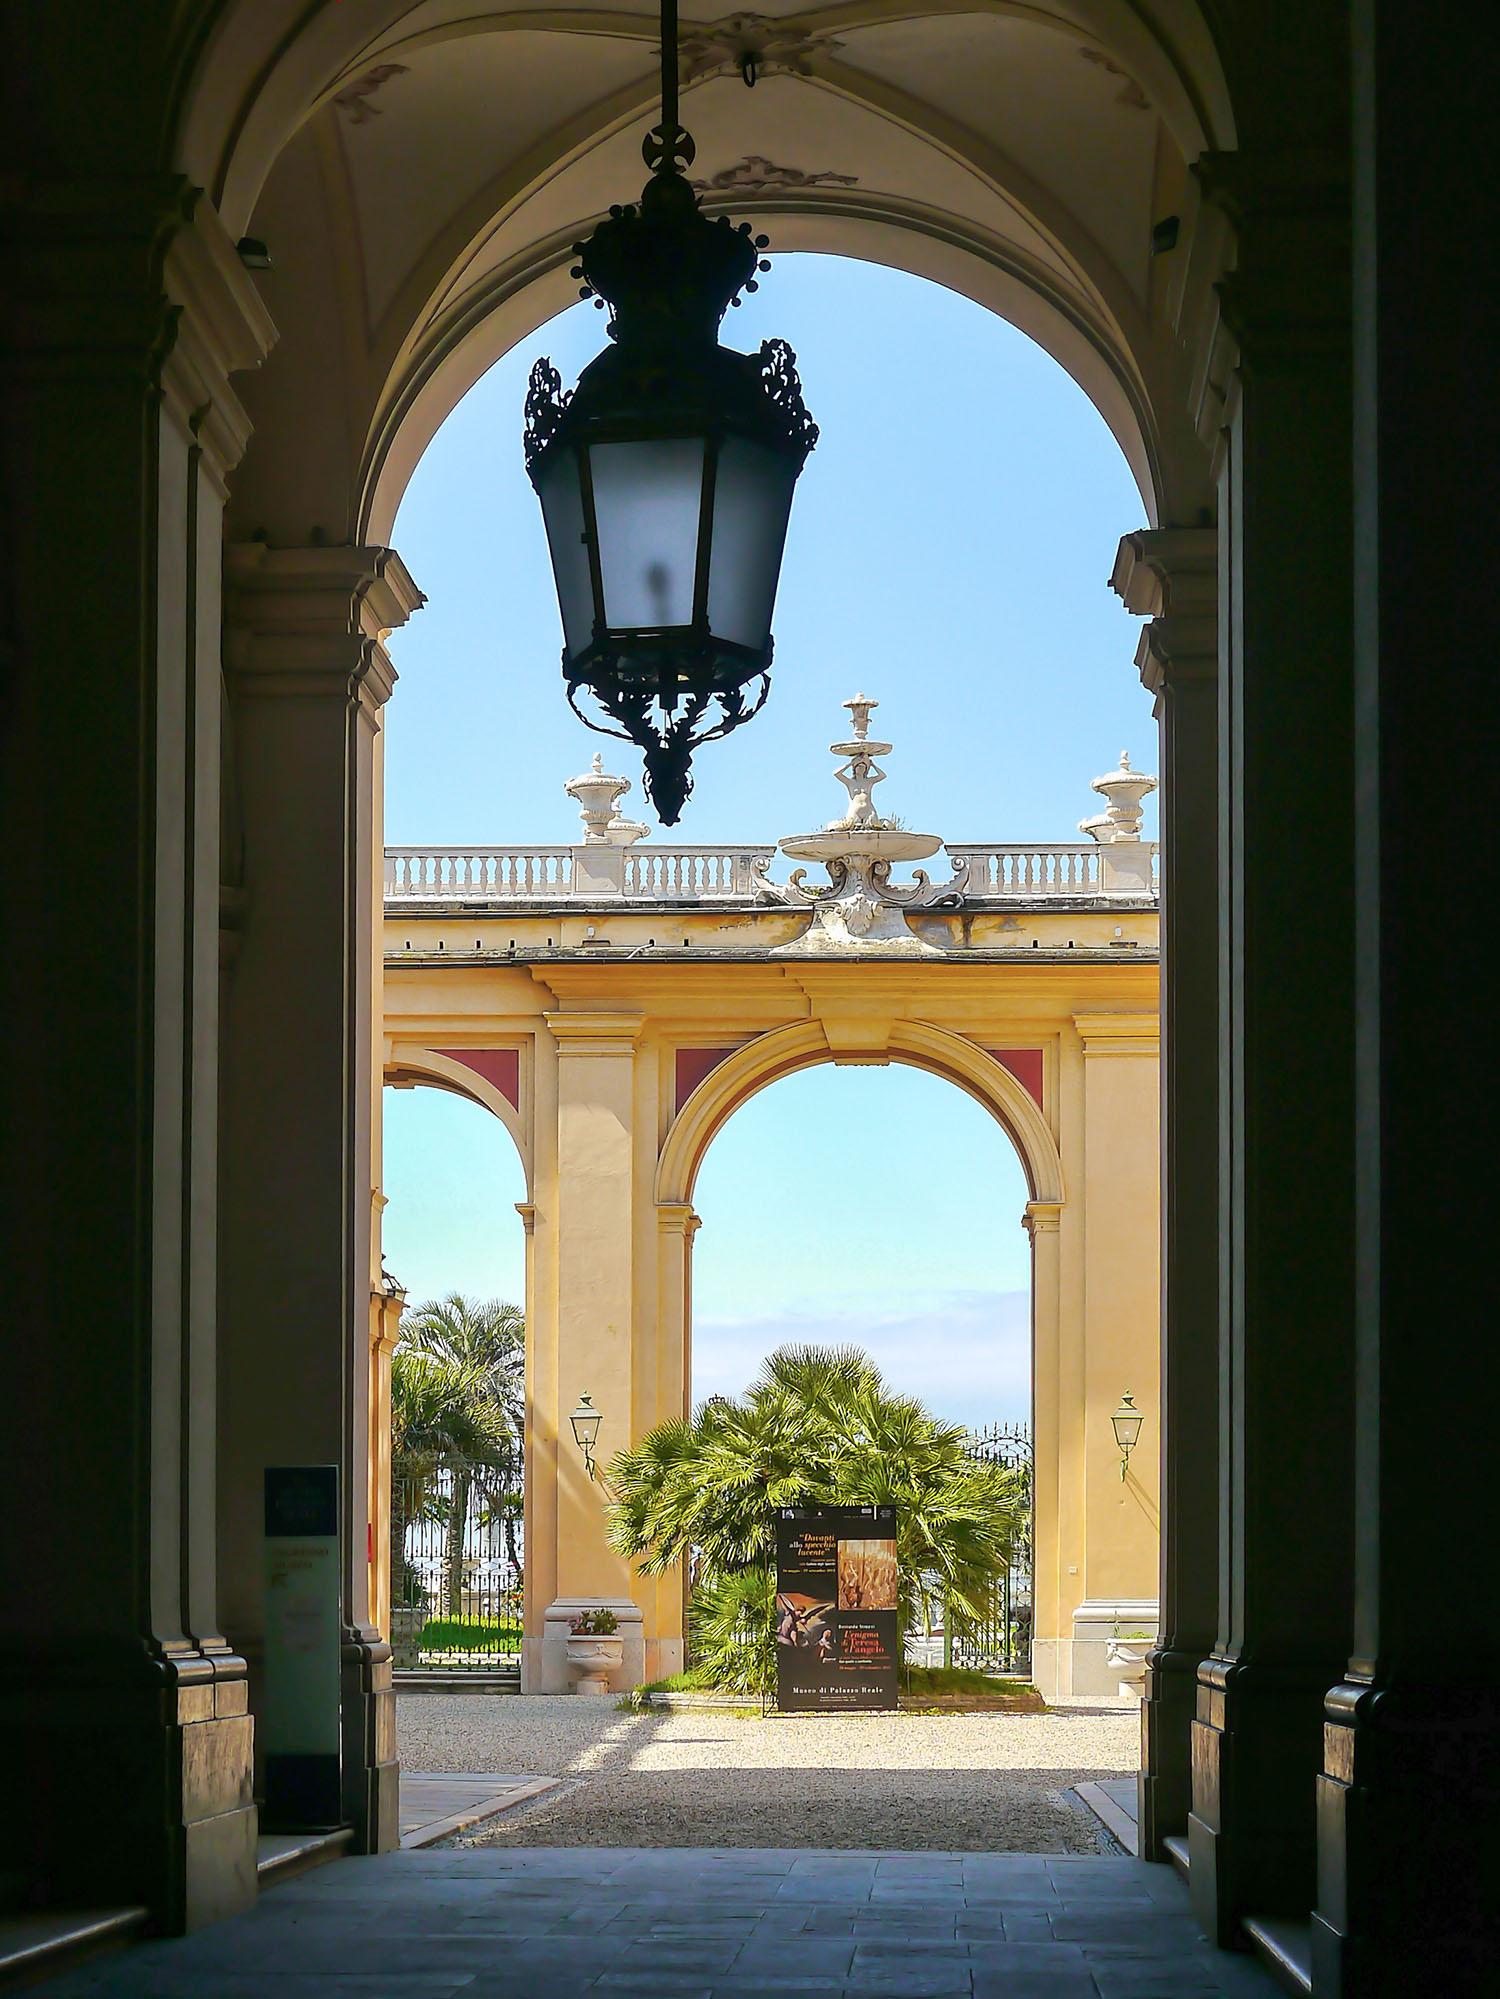 Image: Genoa Archway